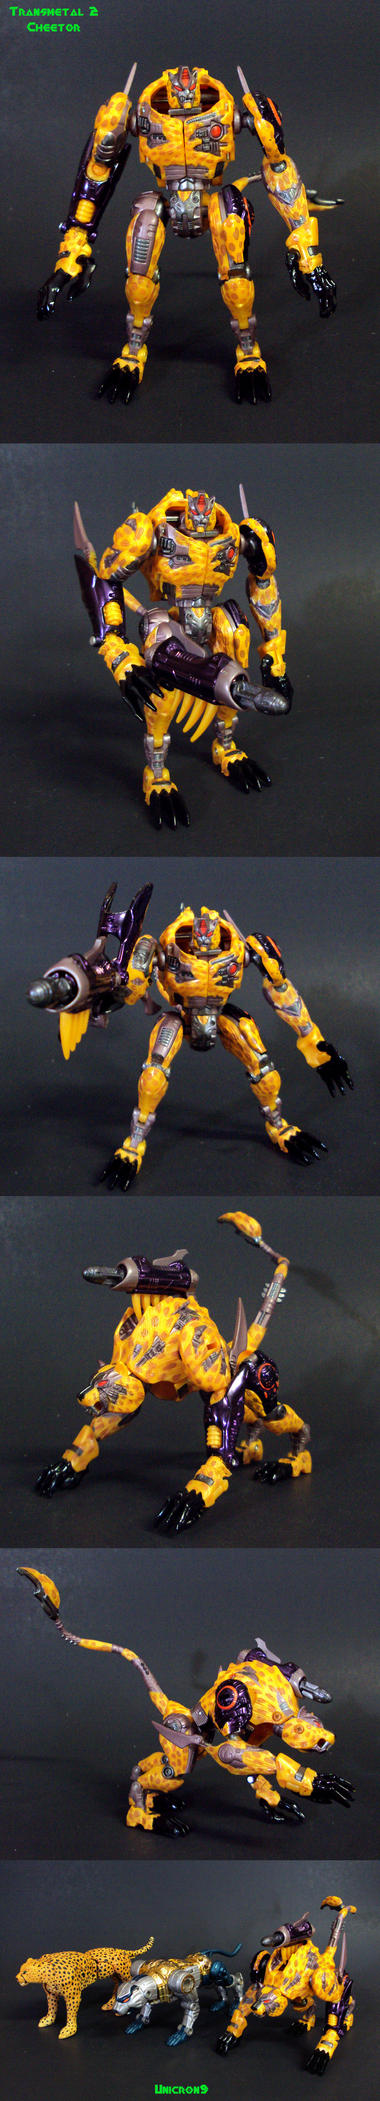 Transmetal 2 Cheetor by Unicron9